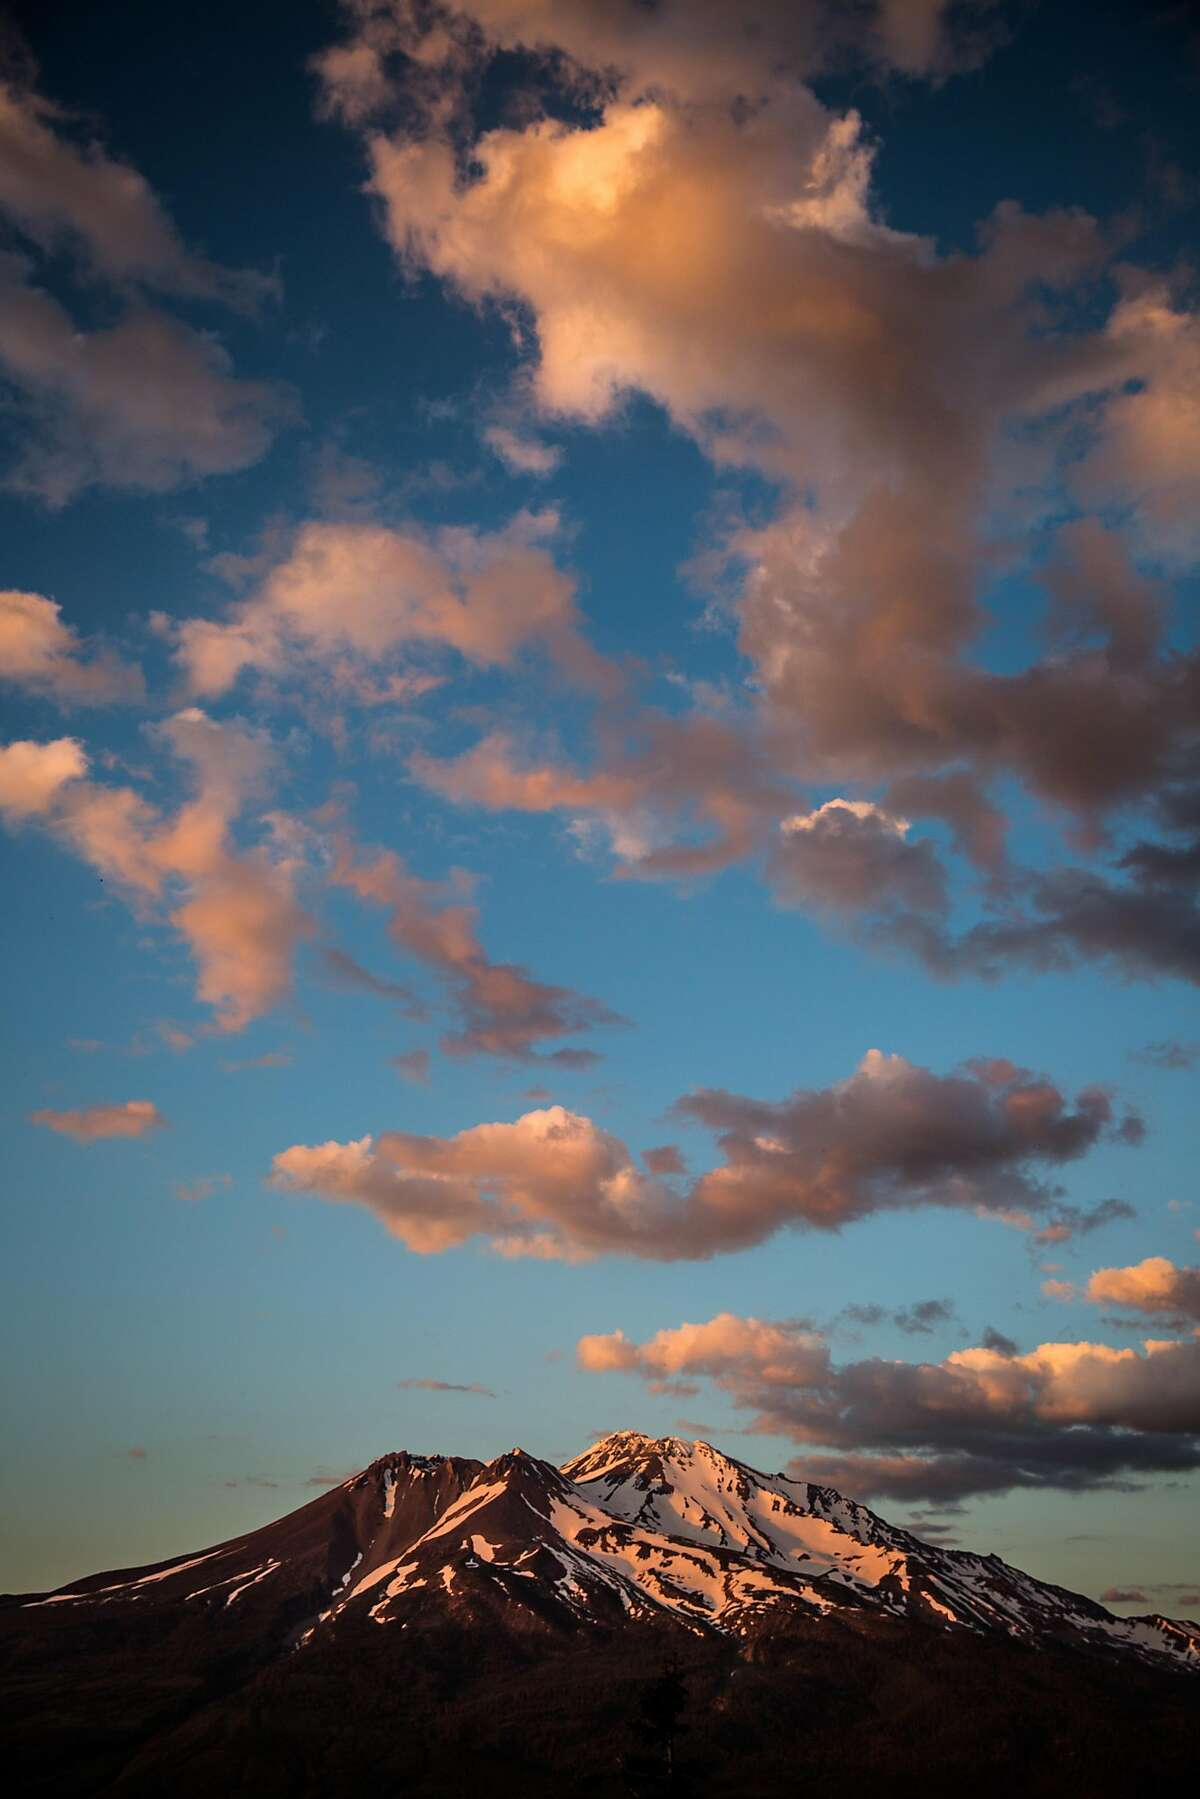 Mt Shasta at sunset, June 29, 2016.